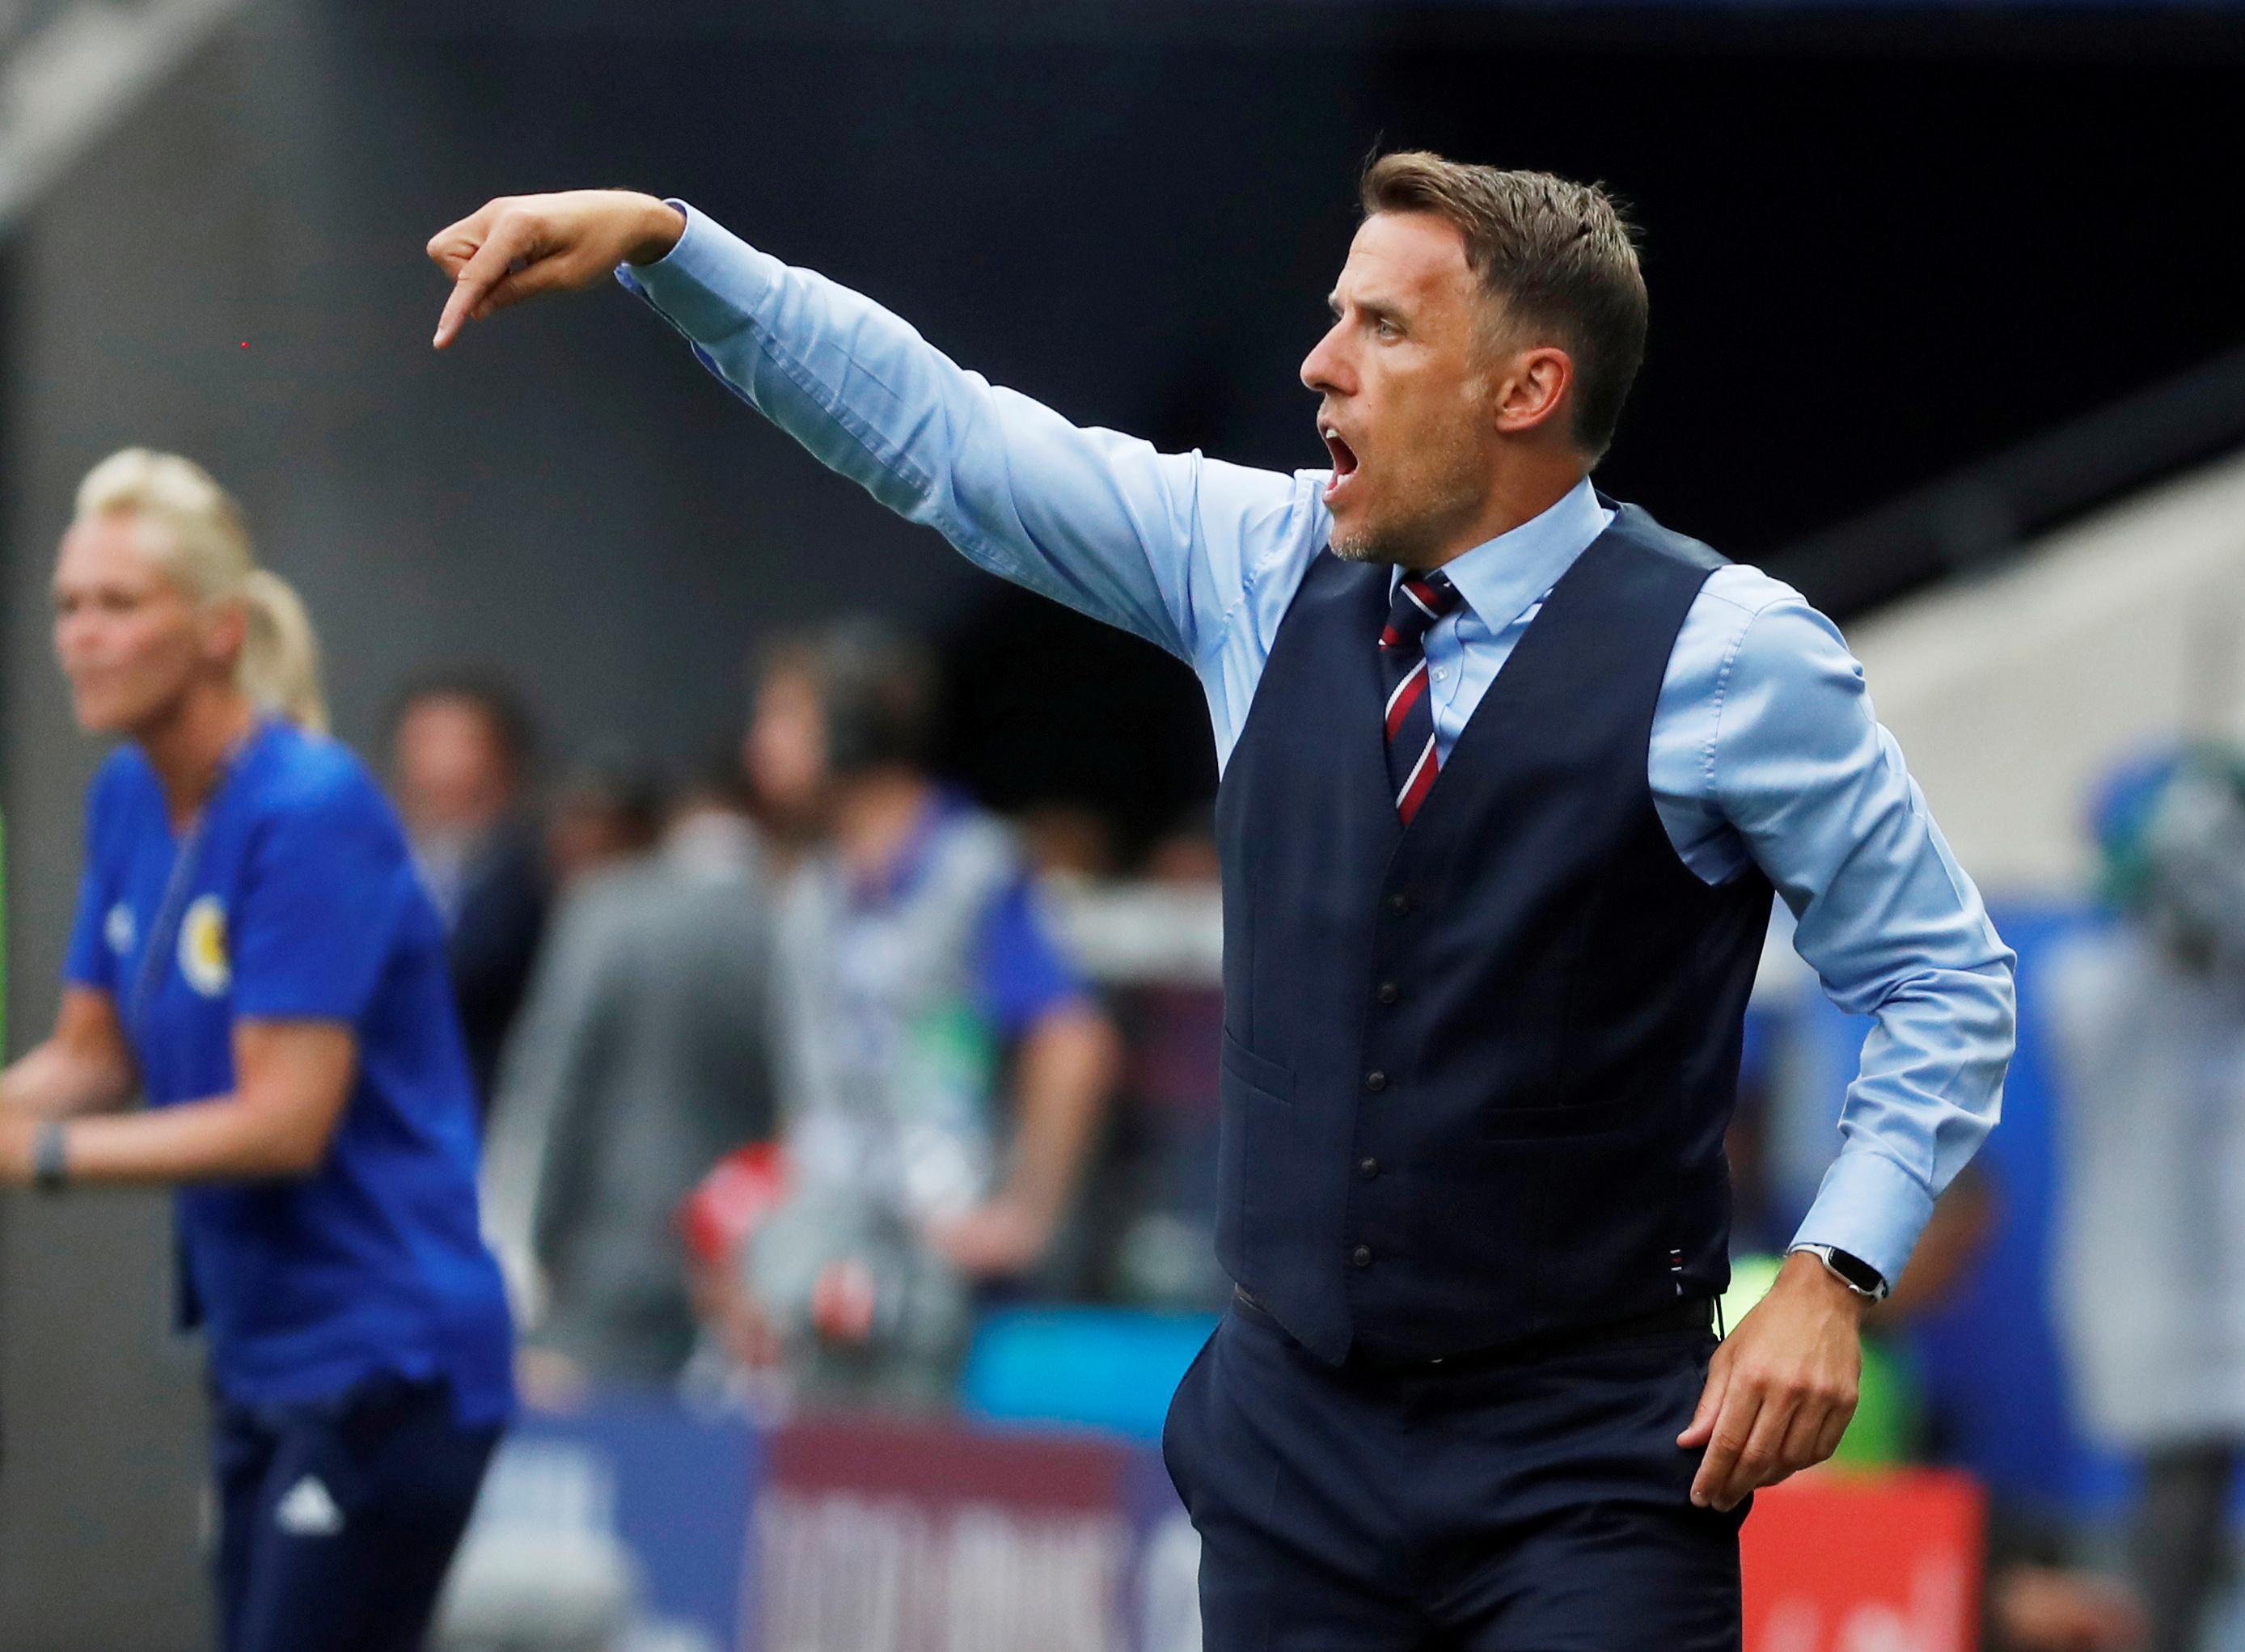 Neville hits back at 'keyboard warrior' Verheijen over World Cup criticism